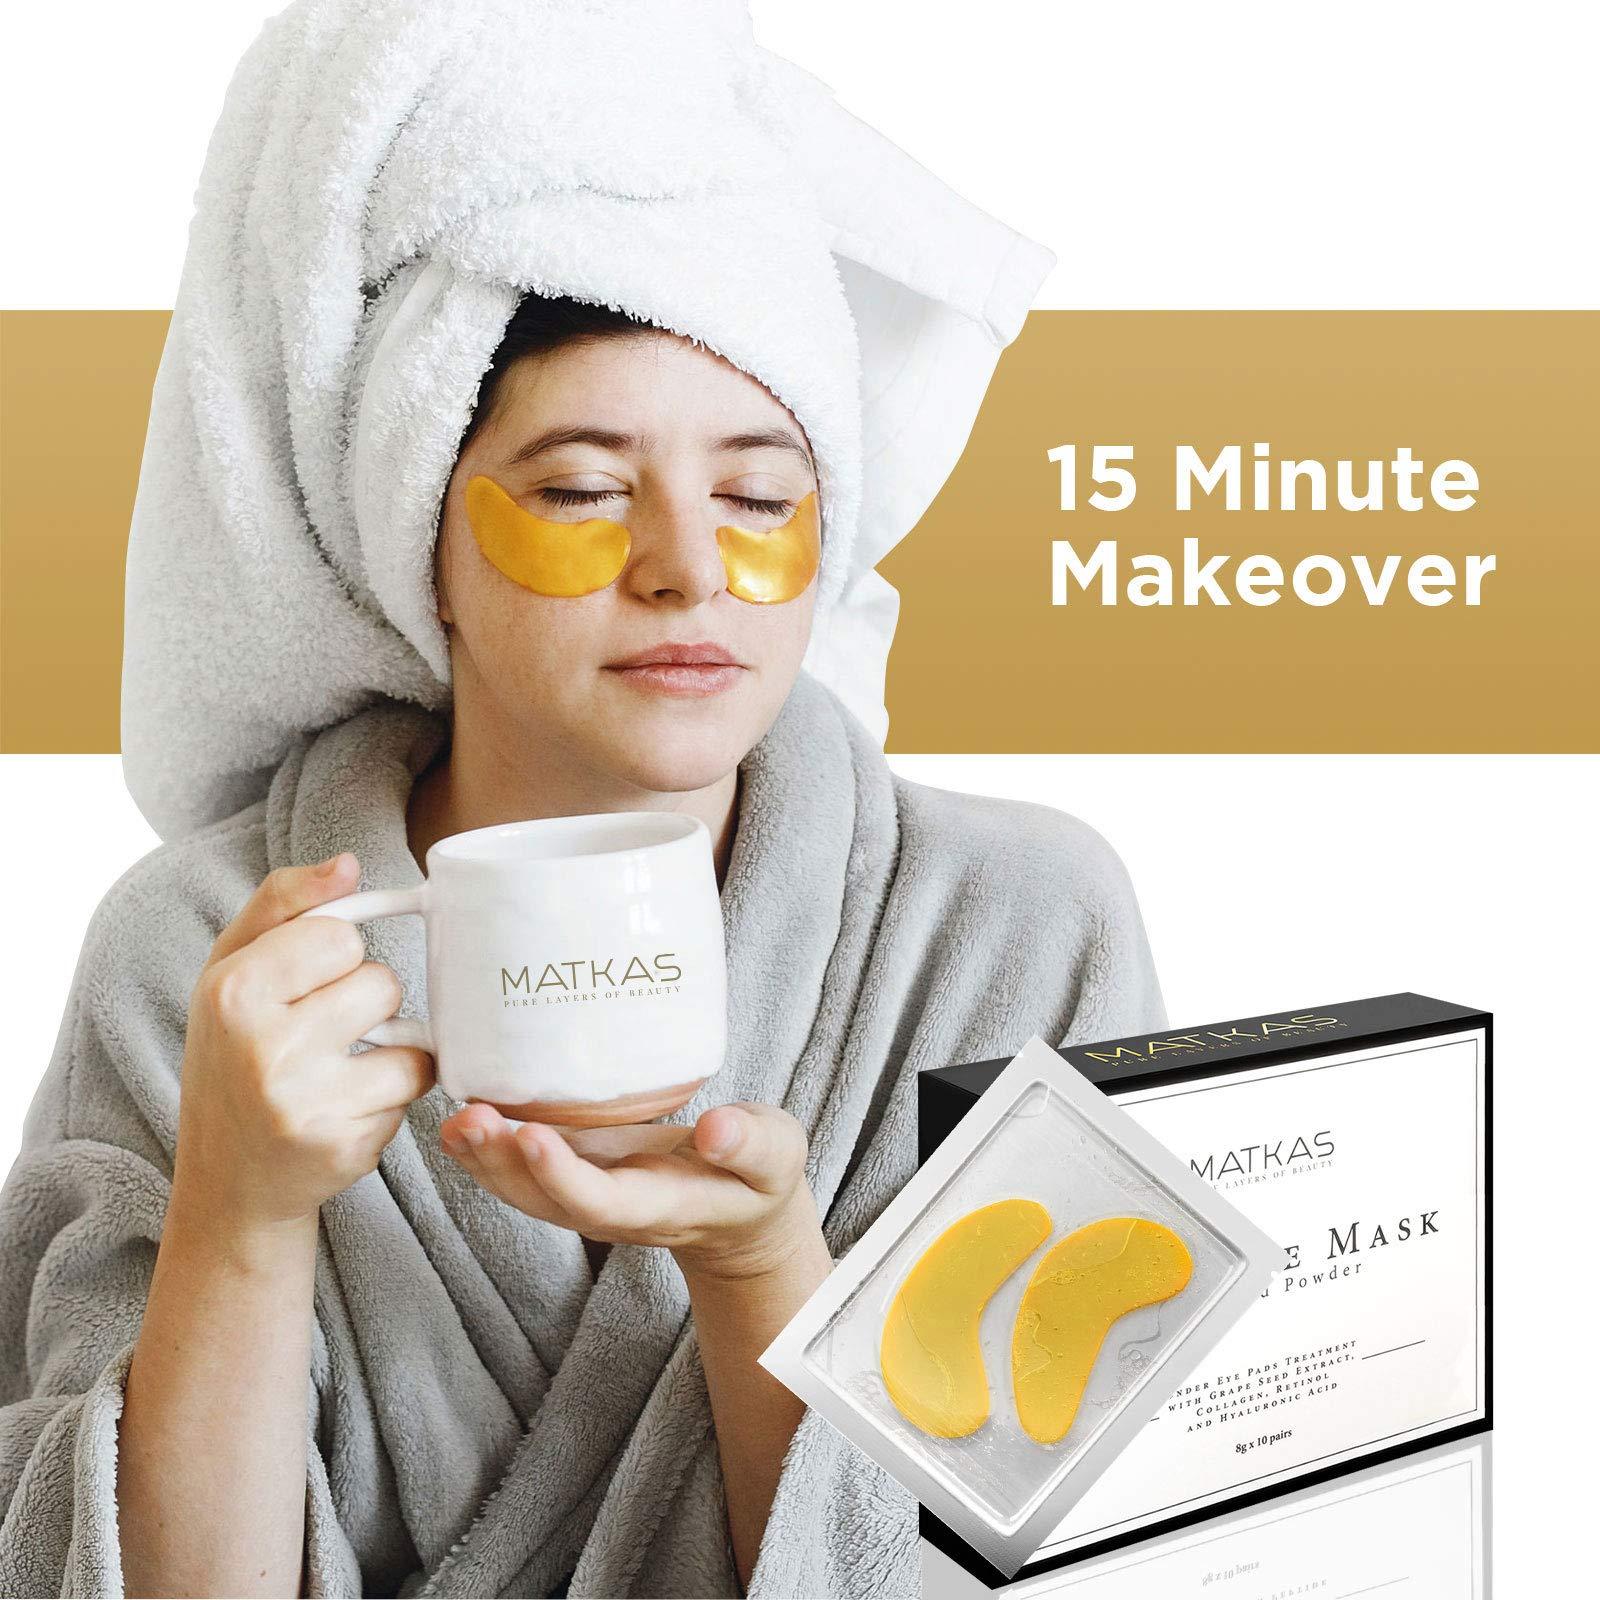 Matkas 24K Gold Eye Treatment Masks - Under Eye Patches, Dark Circles Under Eye Treatment, Under Eye Bags Treatment, Eye Mask for Puffy Eyes, Anti-Wrinkle, Undereye Dark Circles, Gel Pads 10 Pairs by MATKAS